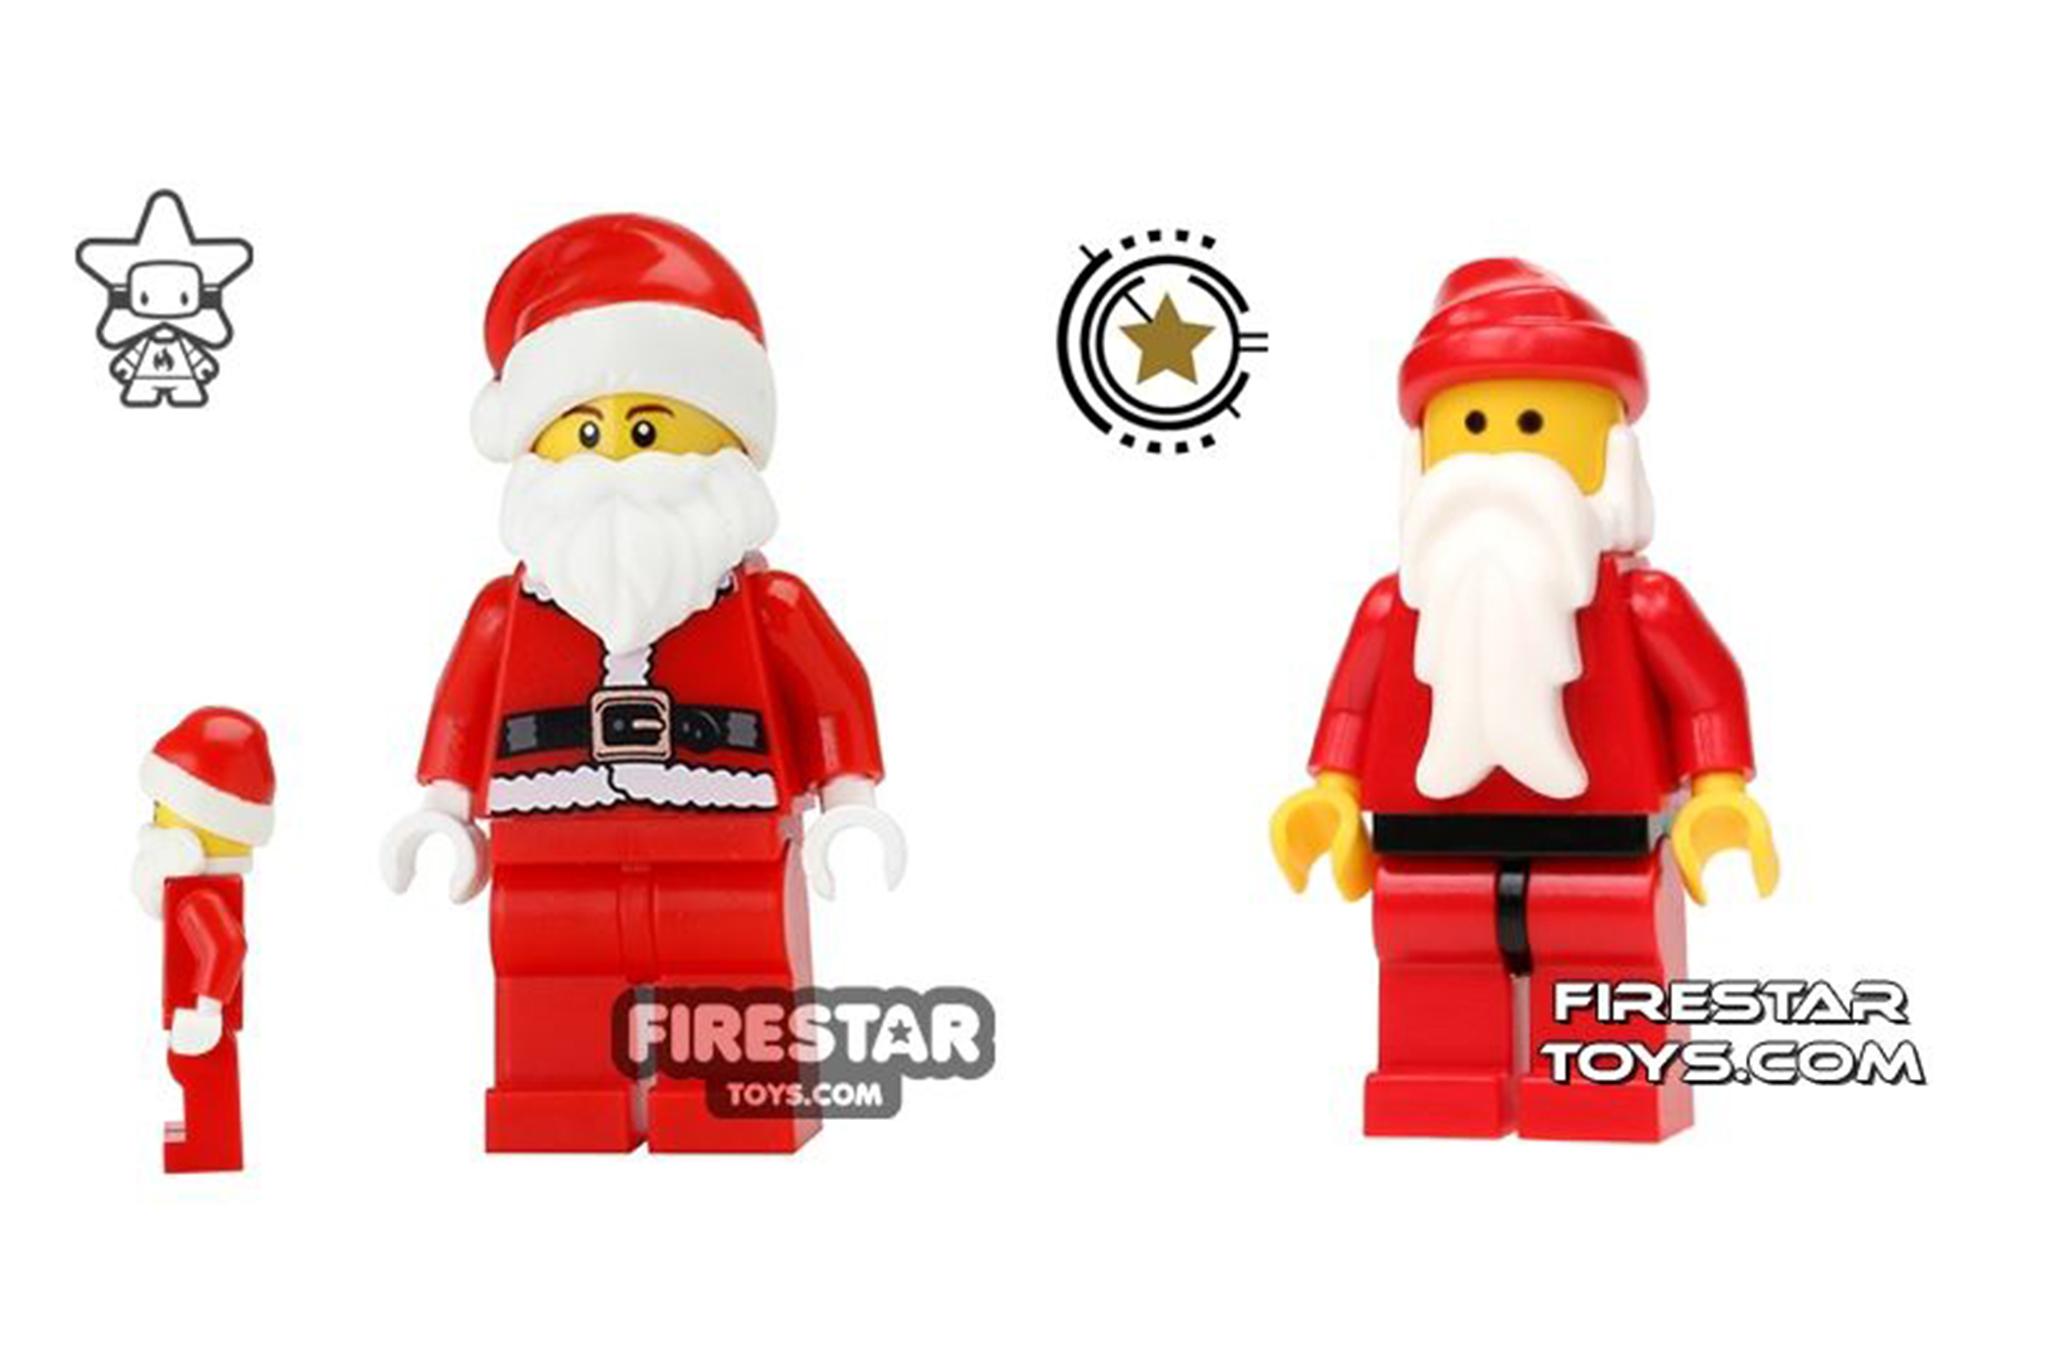 LEGO Christmas Minifigures - Old LEGO Santa and new LEGO Santa